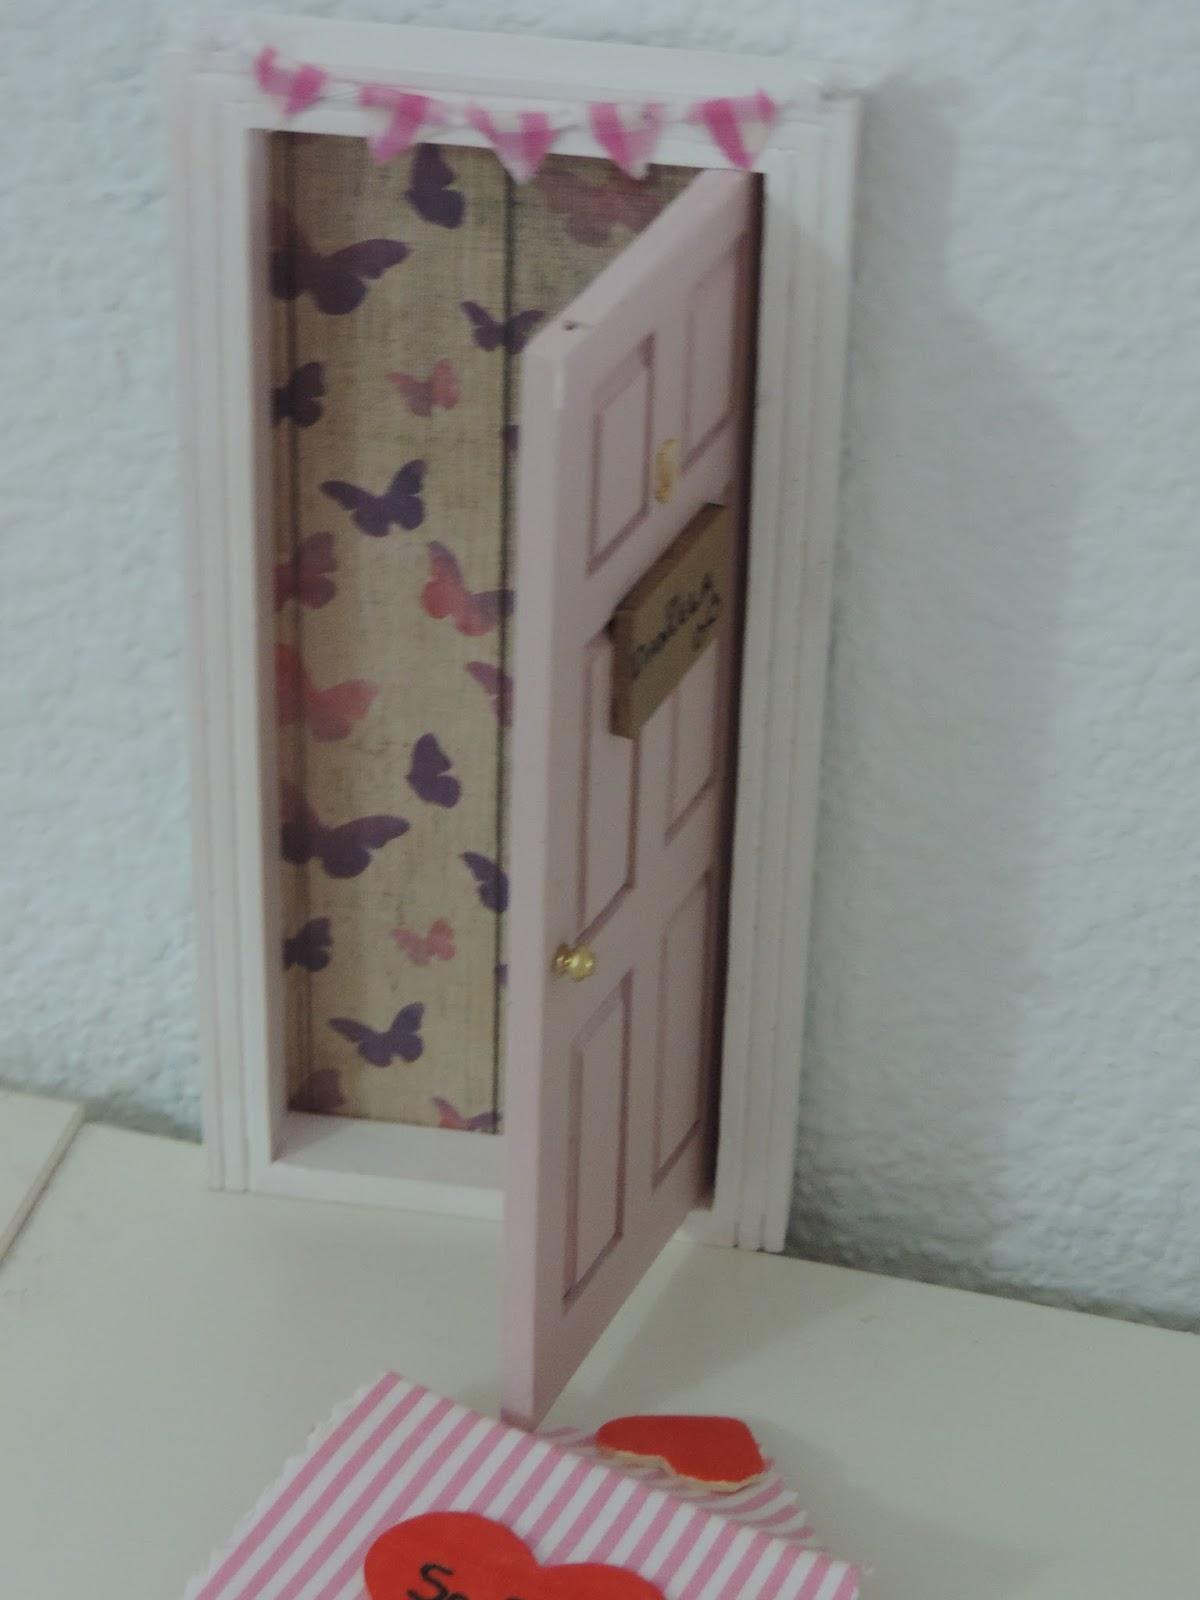 El taller de party handmade puerta ratoncito perez de for Puertas ratoncito perez baratas